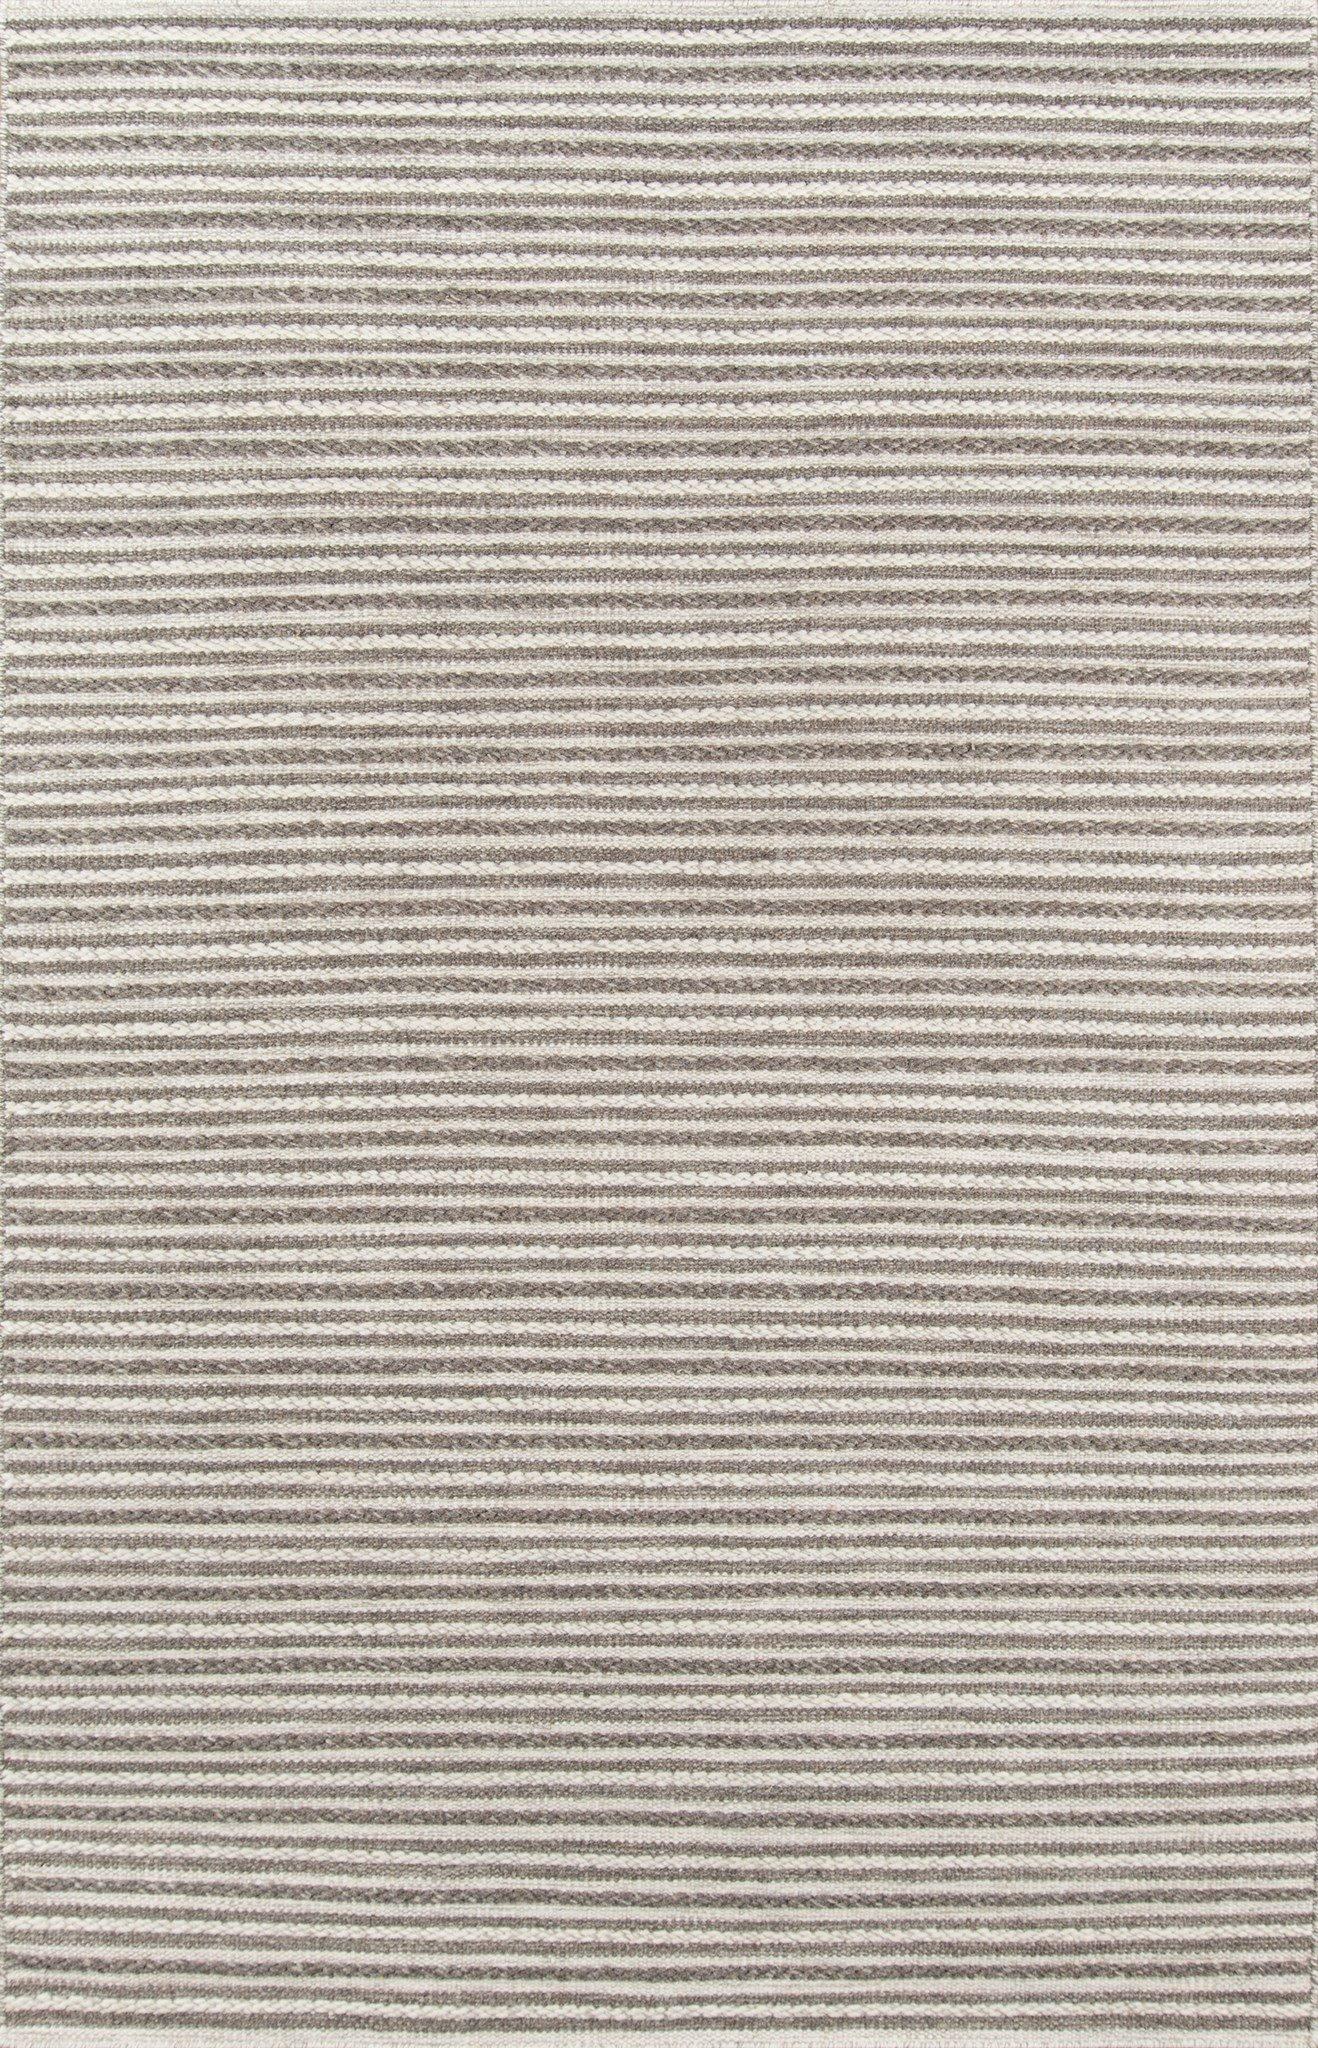 Momeni Rugs MESA0MES-3NAT5080 Mesa Collection, 100% Wool Hand Woven Flatweave Transitional Area Rug, 5' x 8', Natural Brown by Momeni Rugs (Image #1)